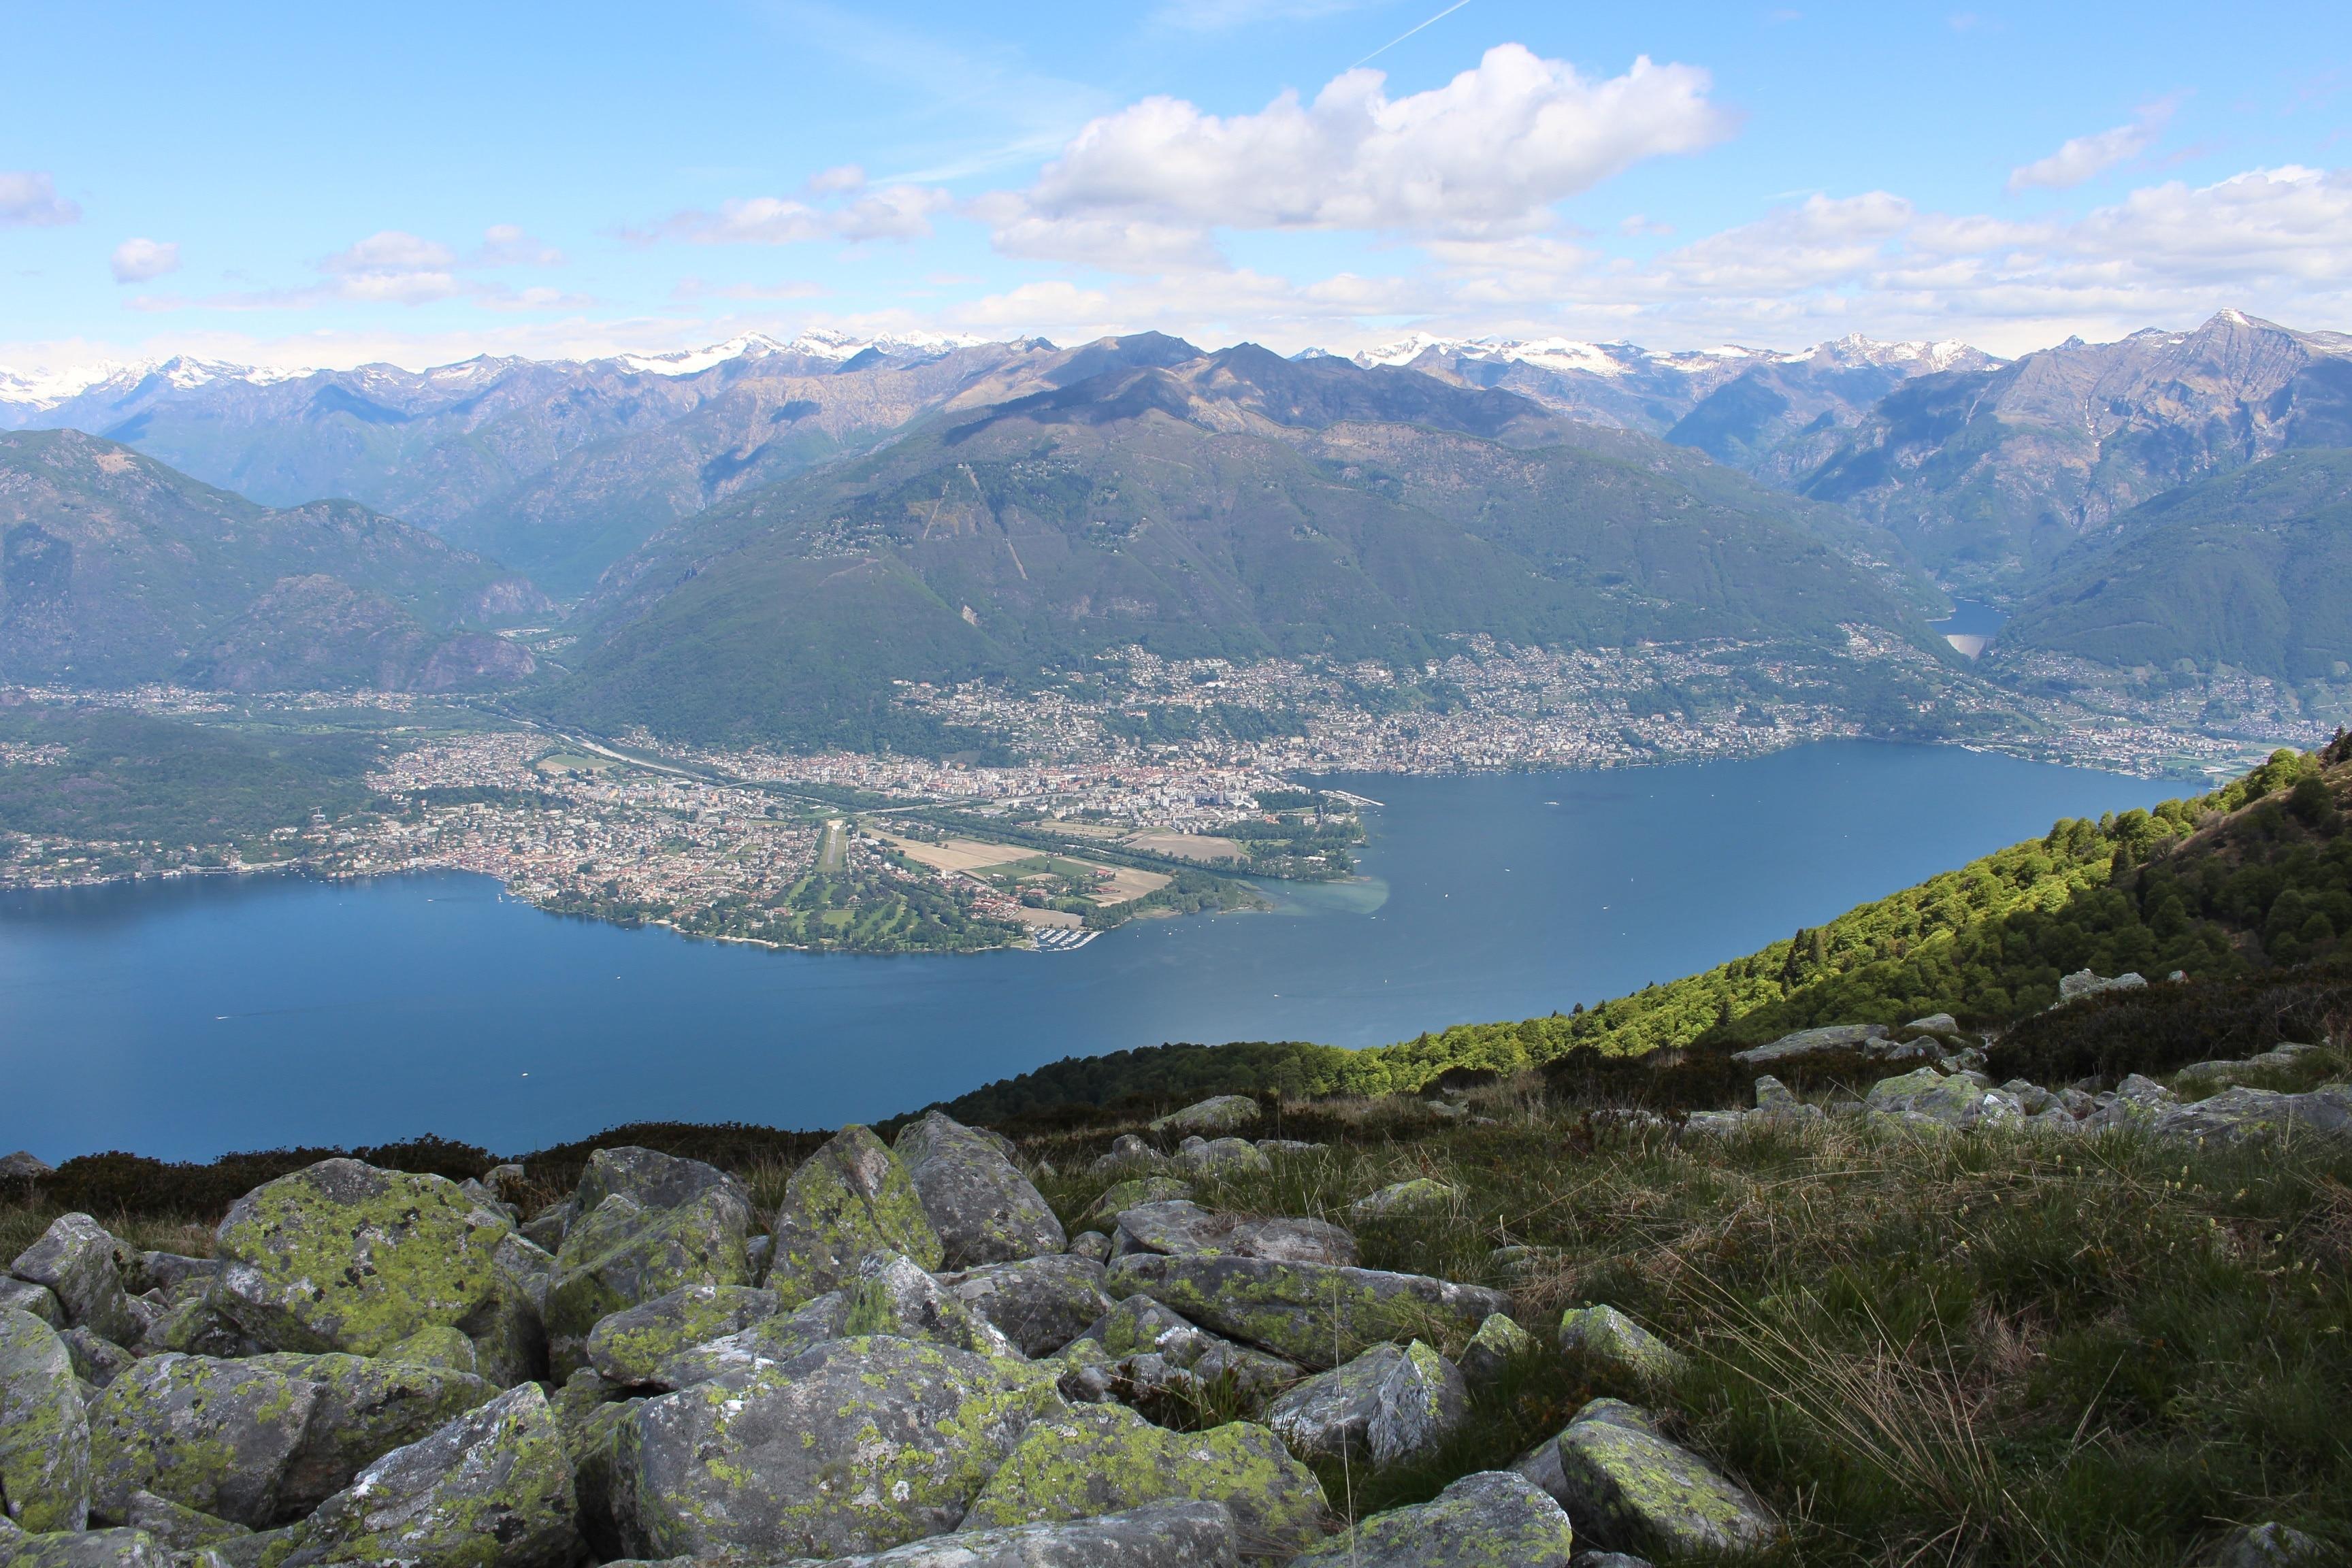 Onsernone, Canton of Ticino, Switzerland